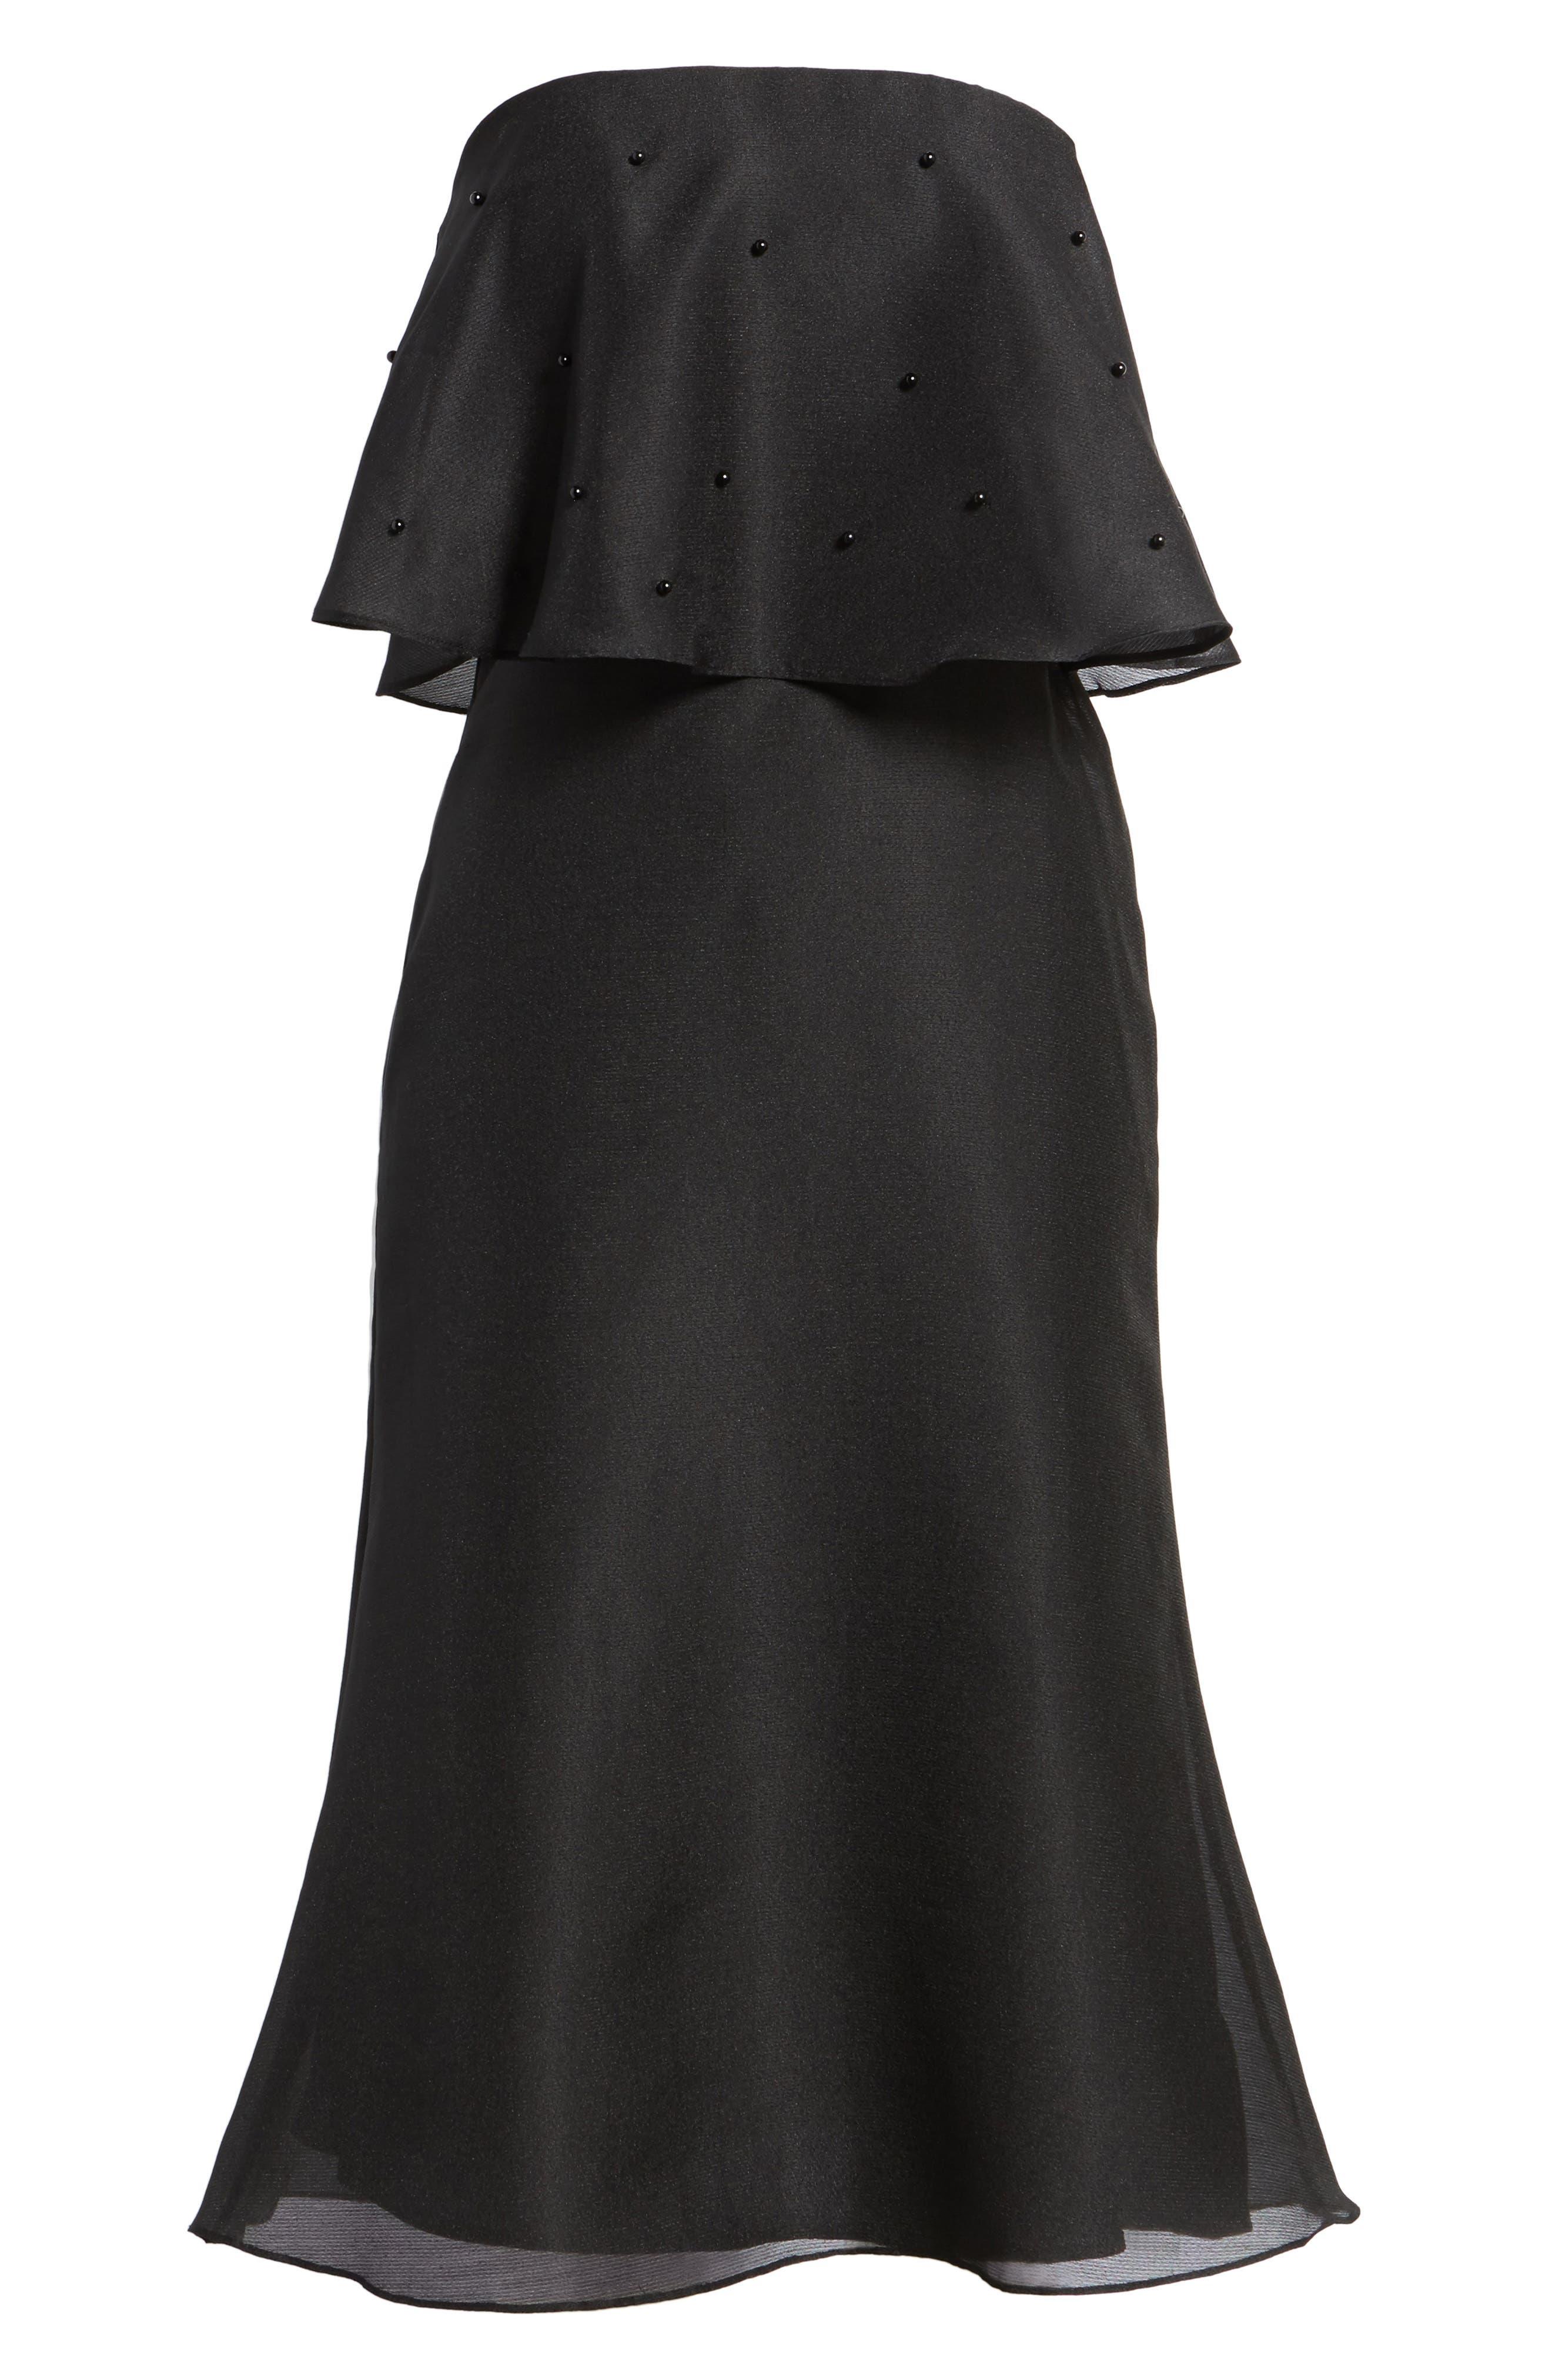 Call Me Strapless Dress,                             Alternate thumbnail 7, color,                             001